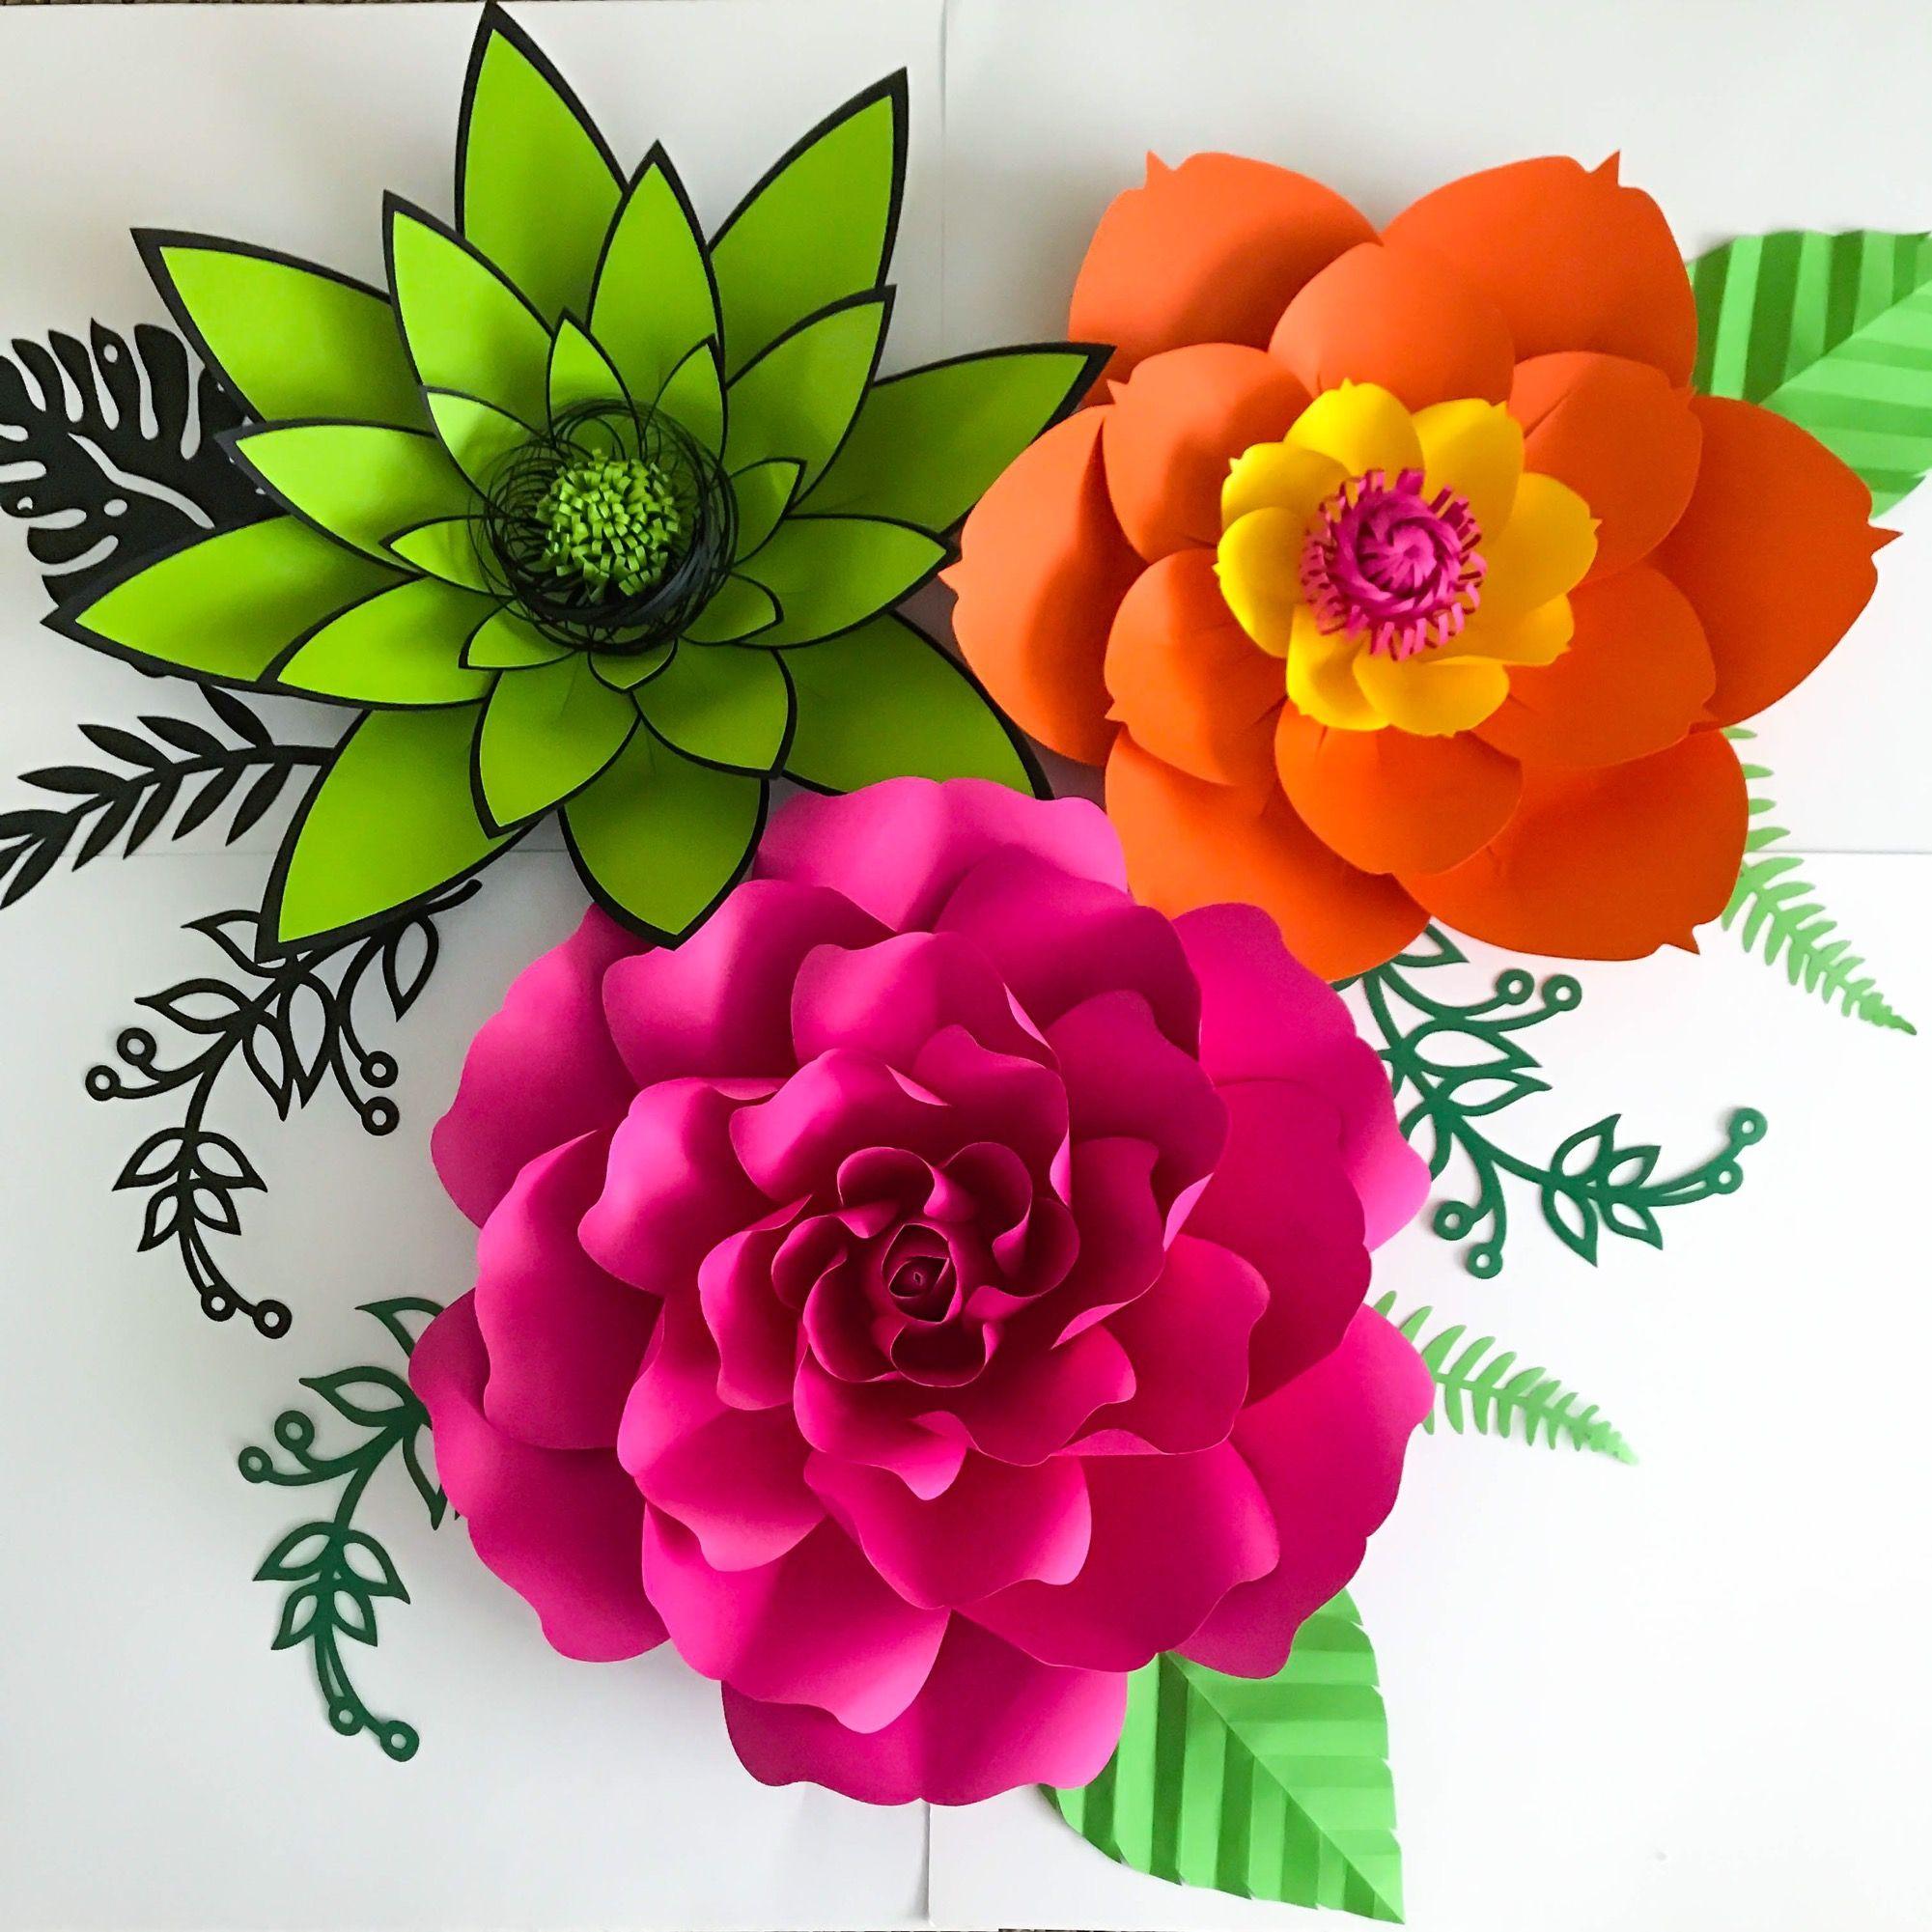 Pin by the crafty sagittarius on paper flower designs by the crafty giant paper flowers flower template patio ideas troll papercraft crafts flowers farewell beautiful mightylinksfo